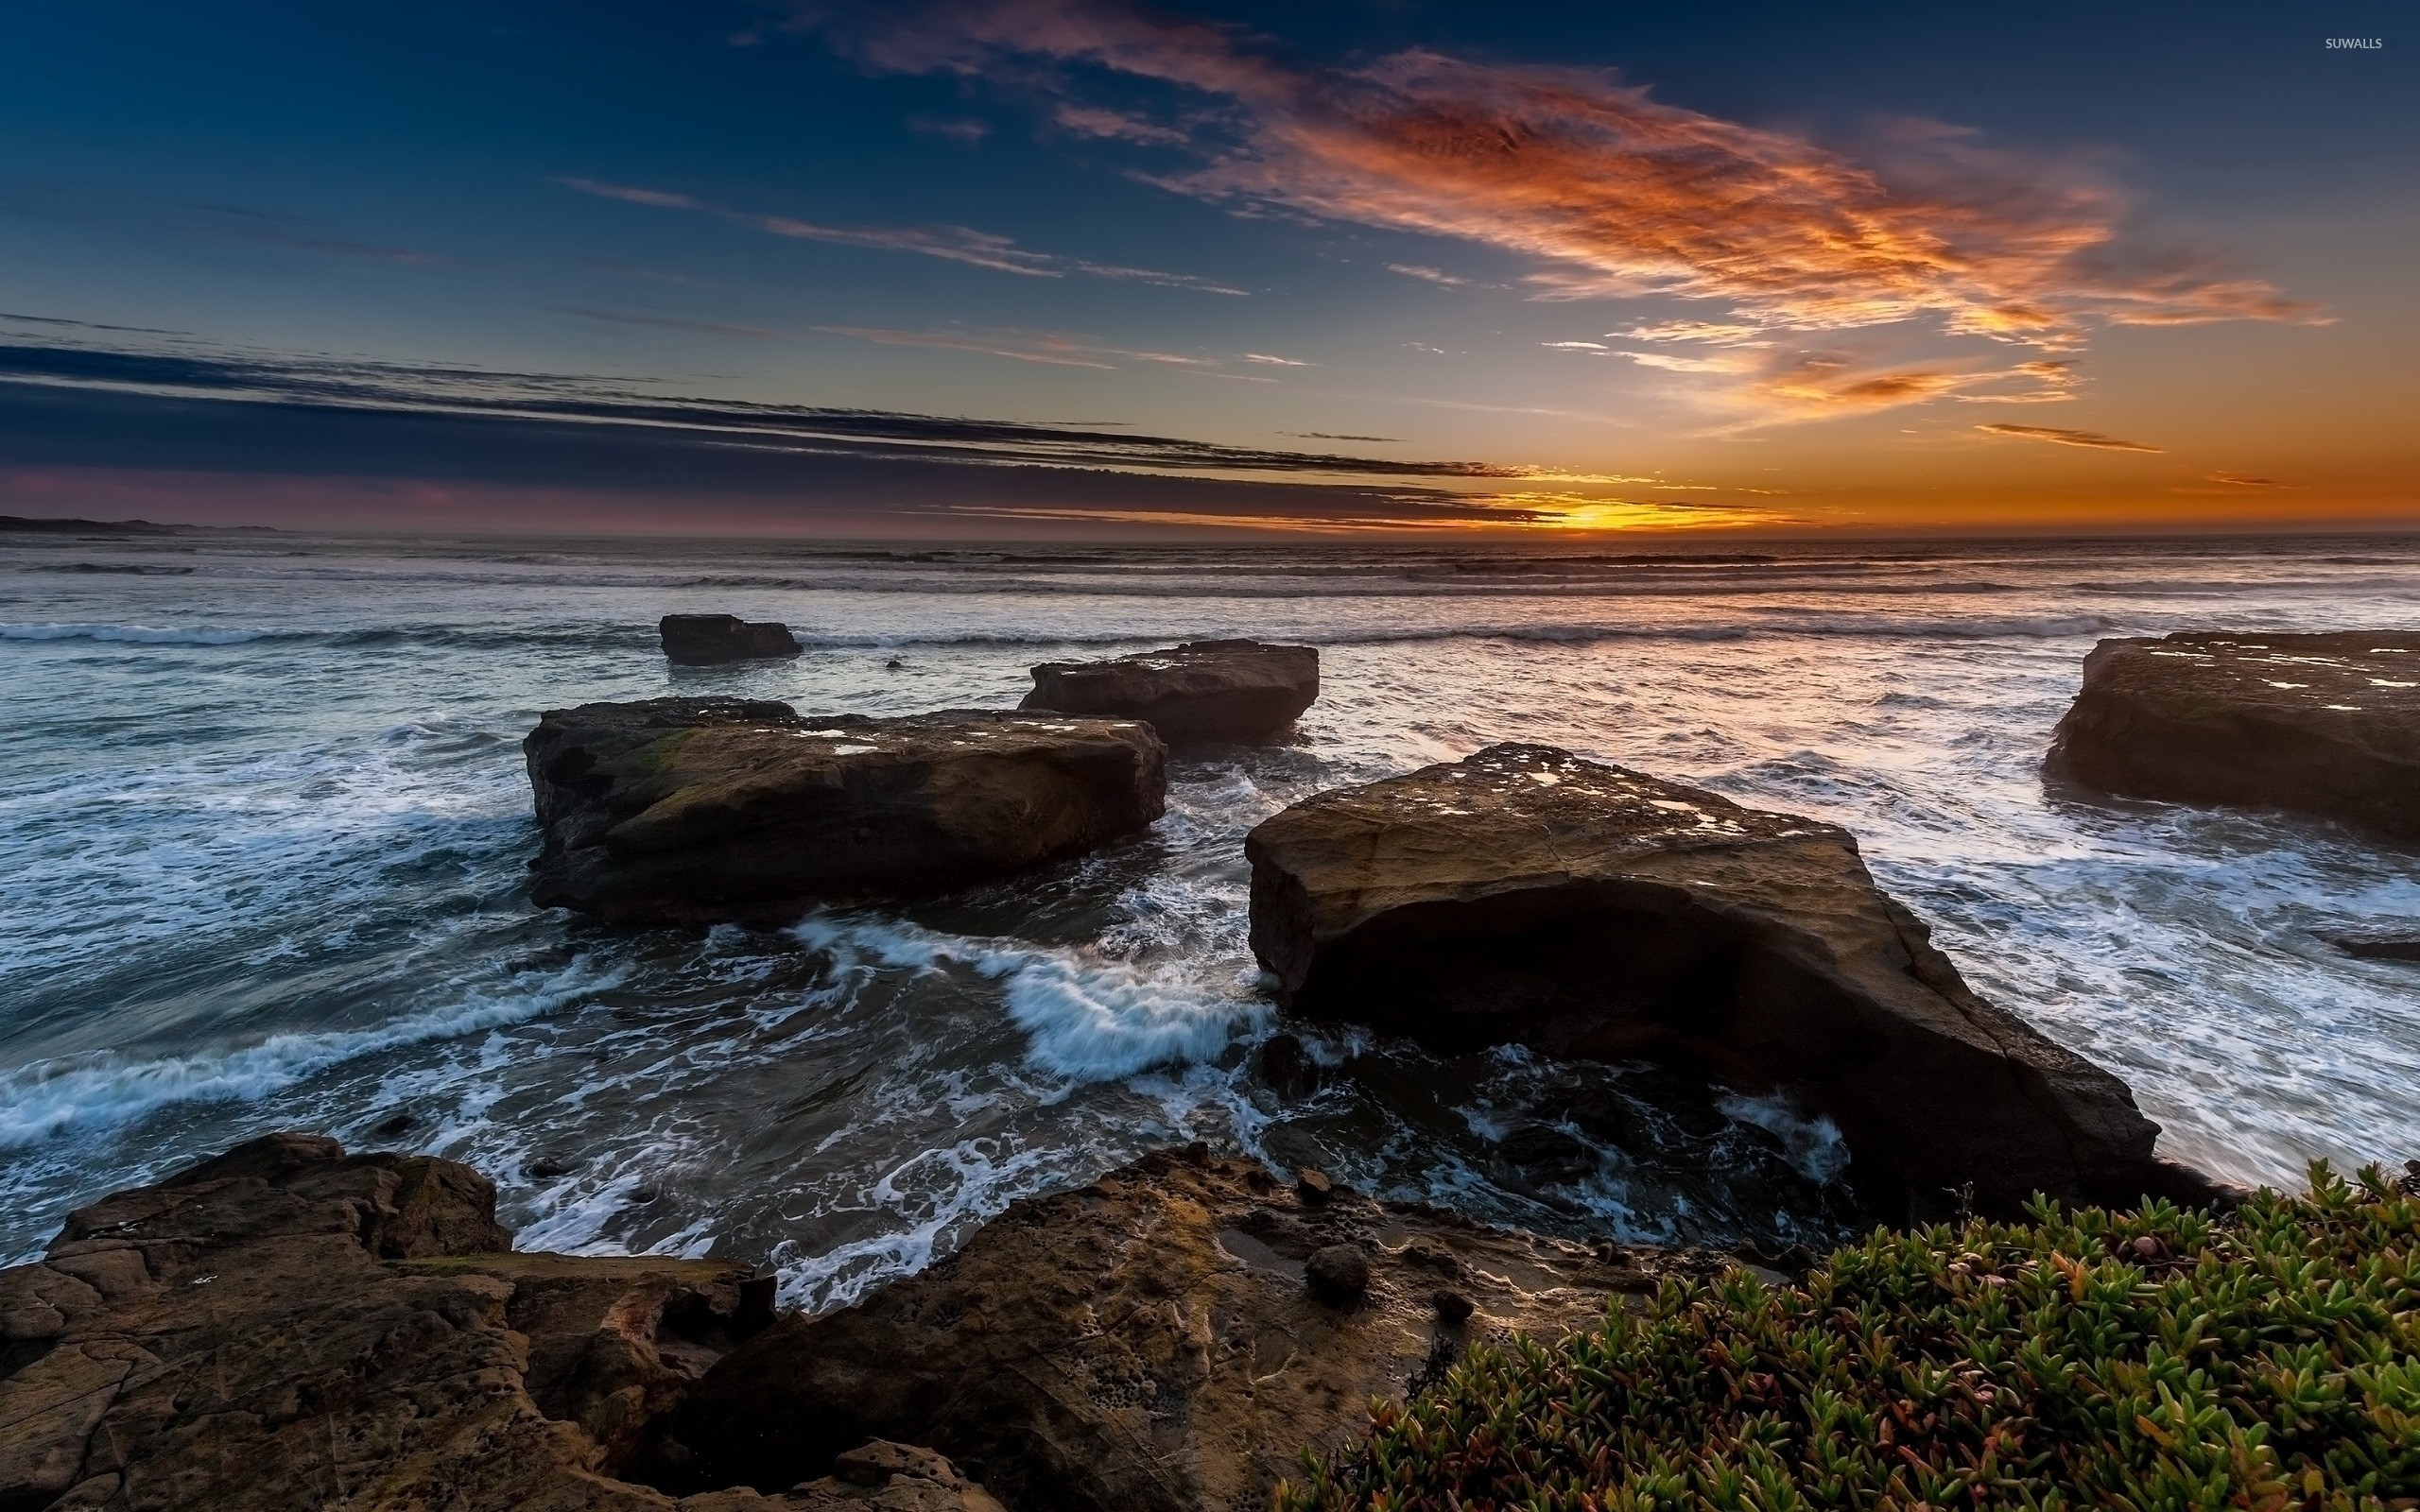 Beautiful ocean sunset above the rocky shore wallpaper